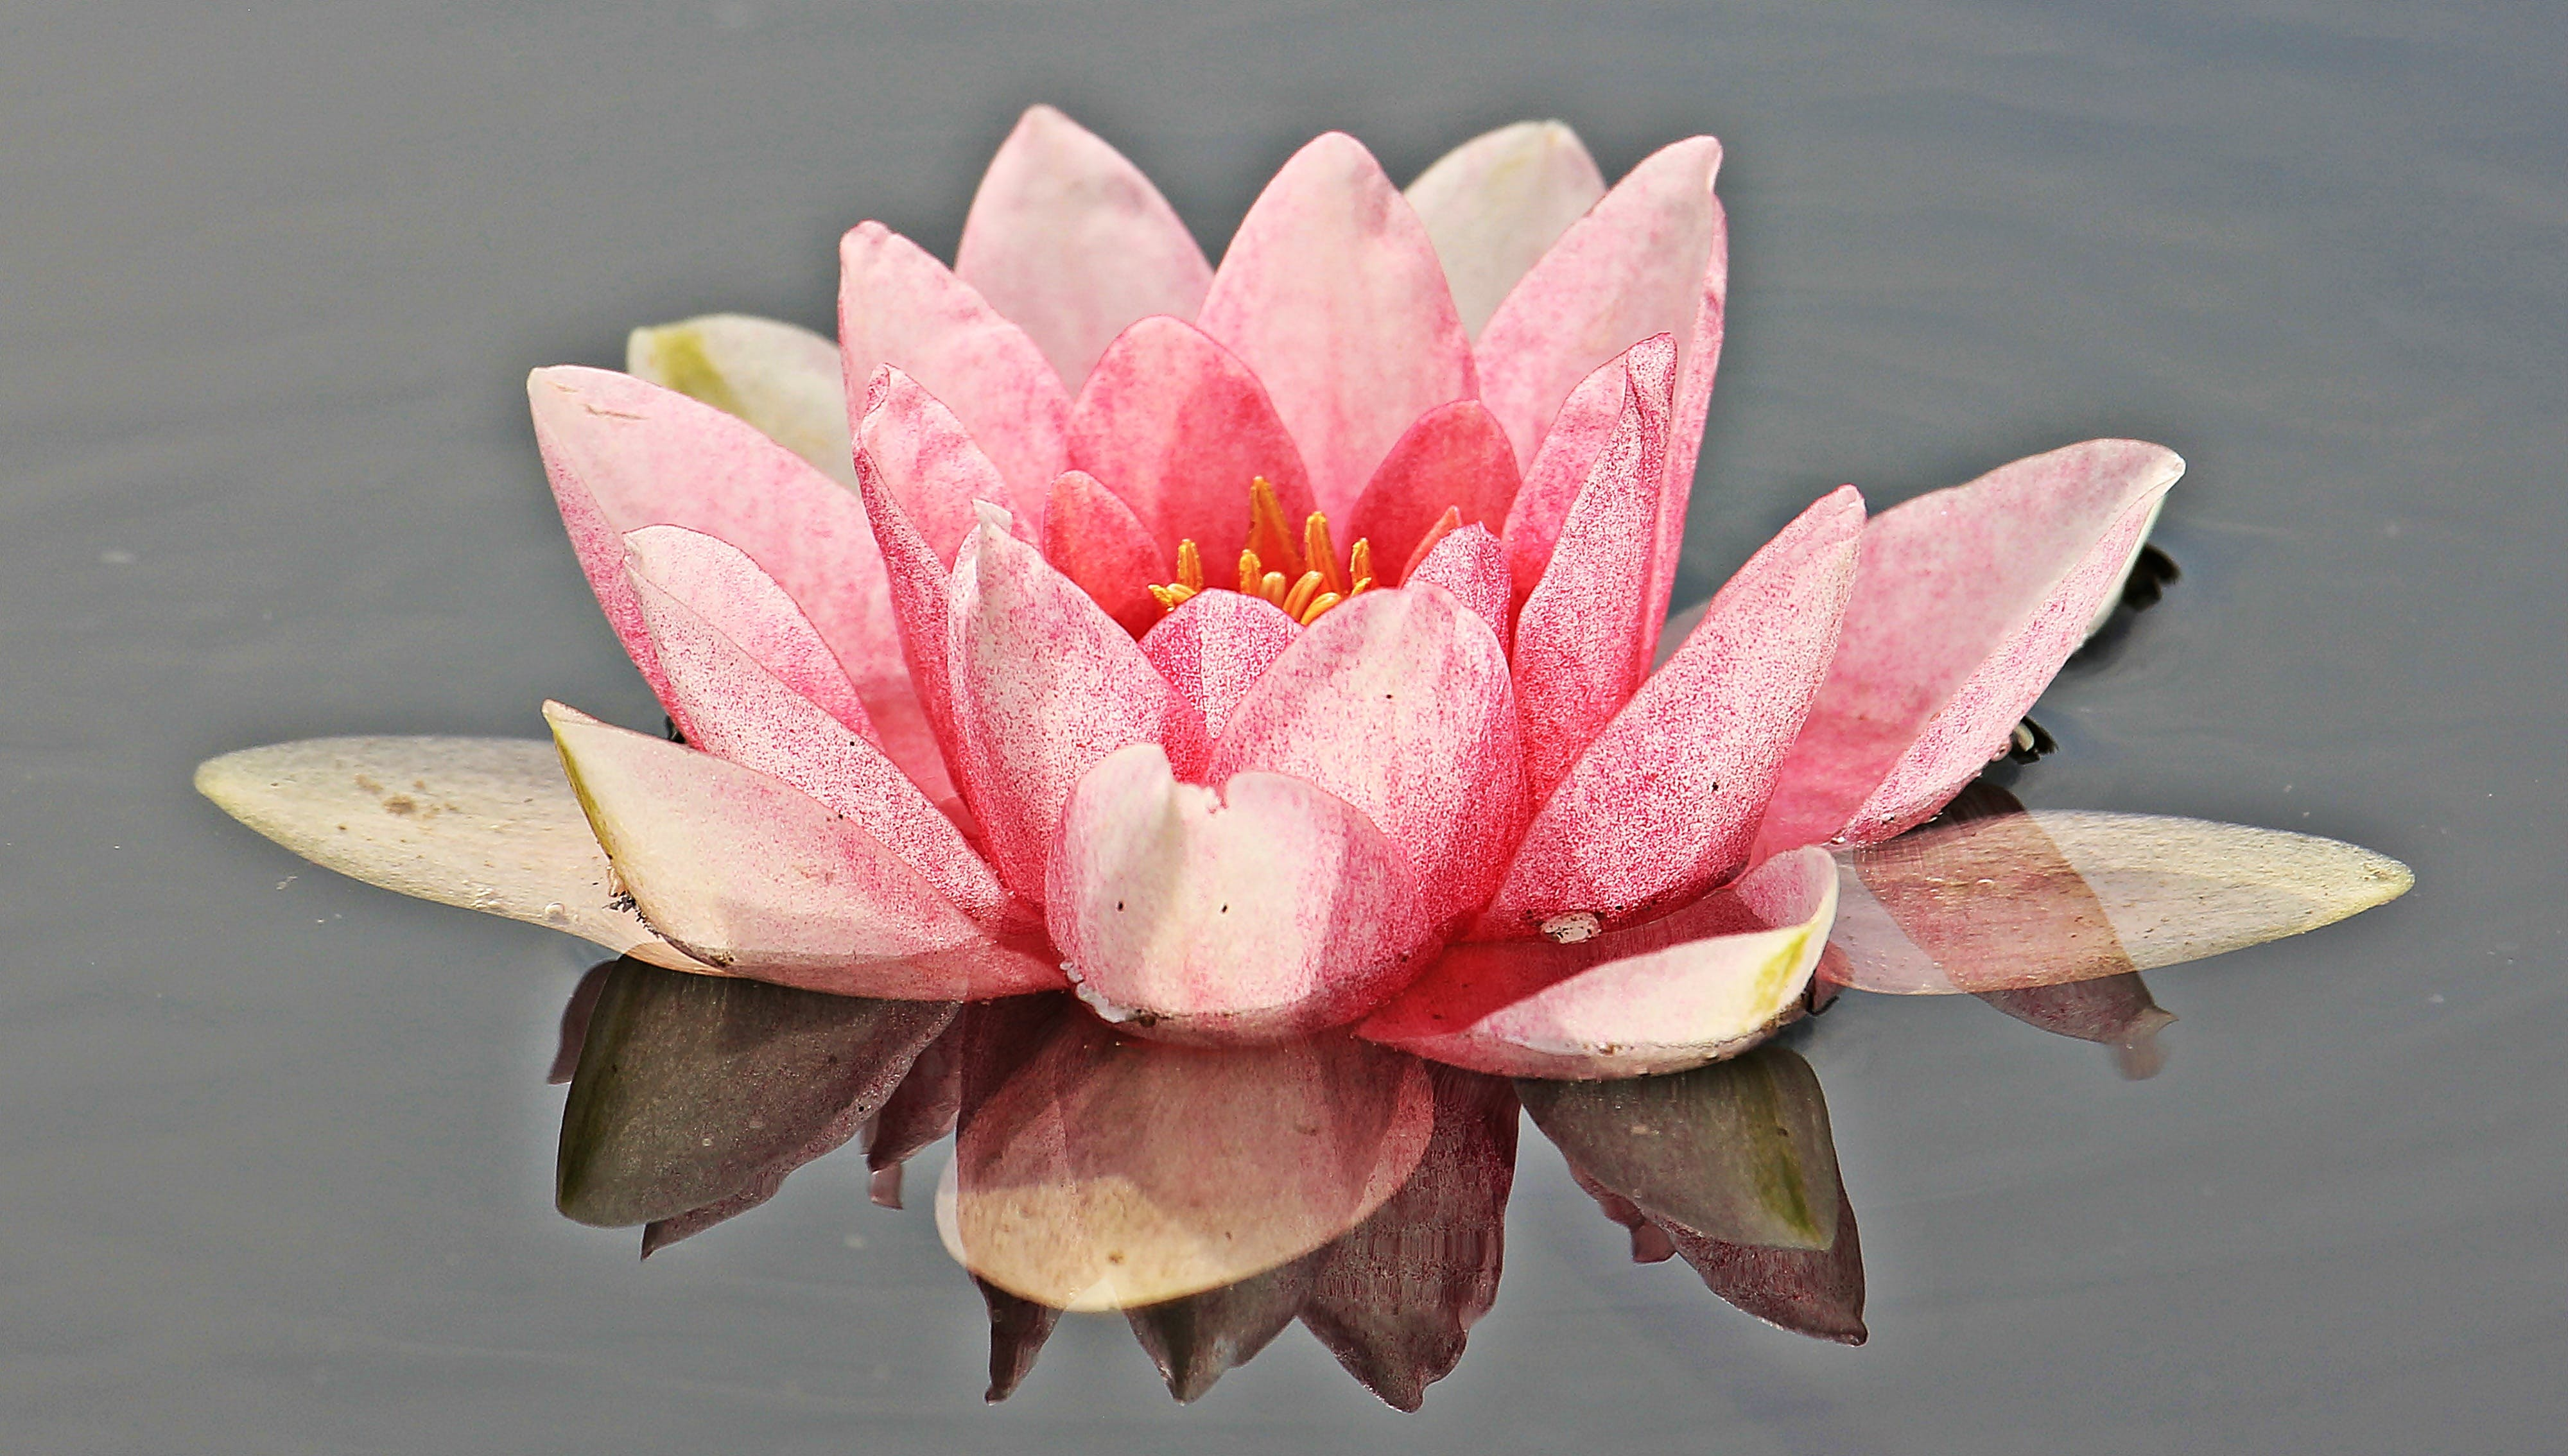 zu blühen, blume, blüte, blütenblätter